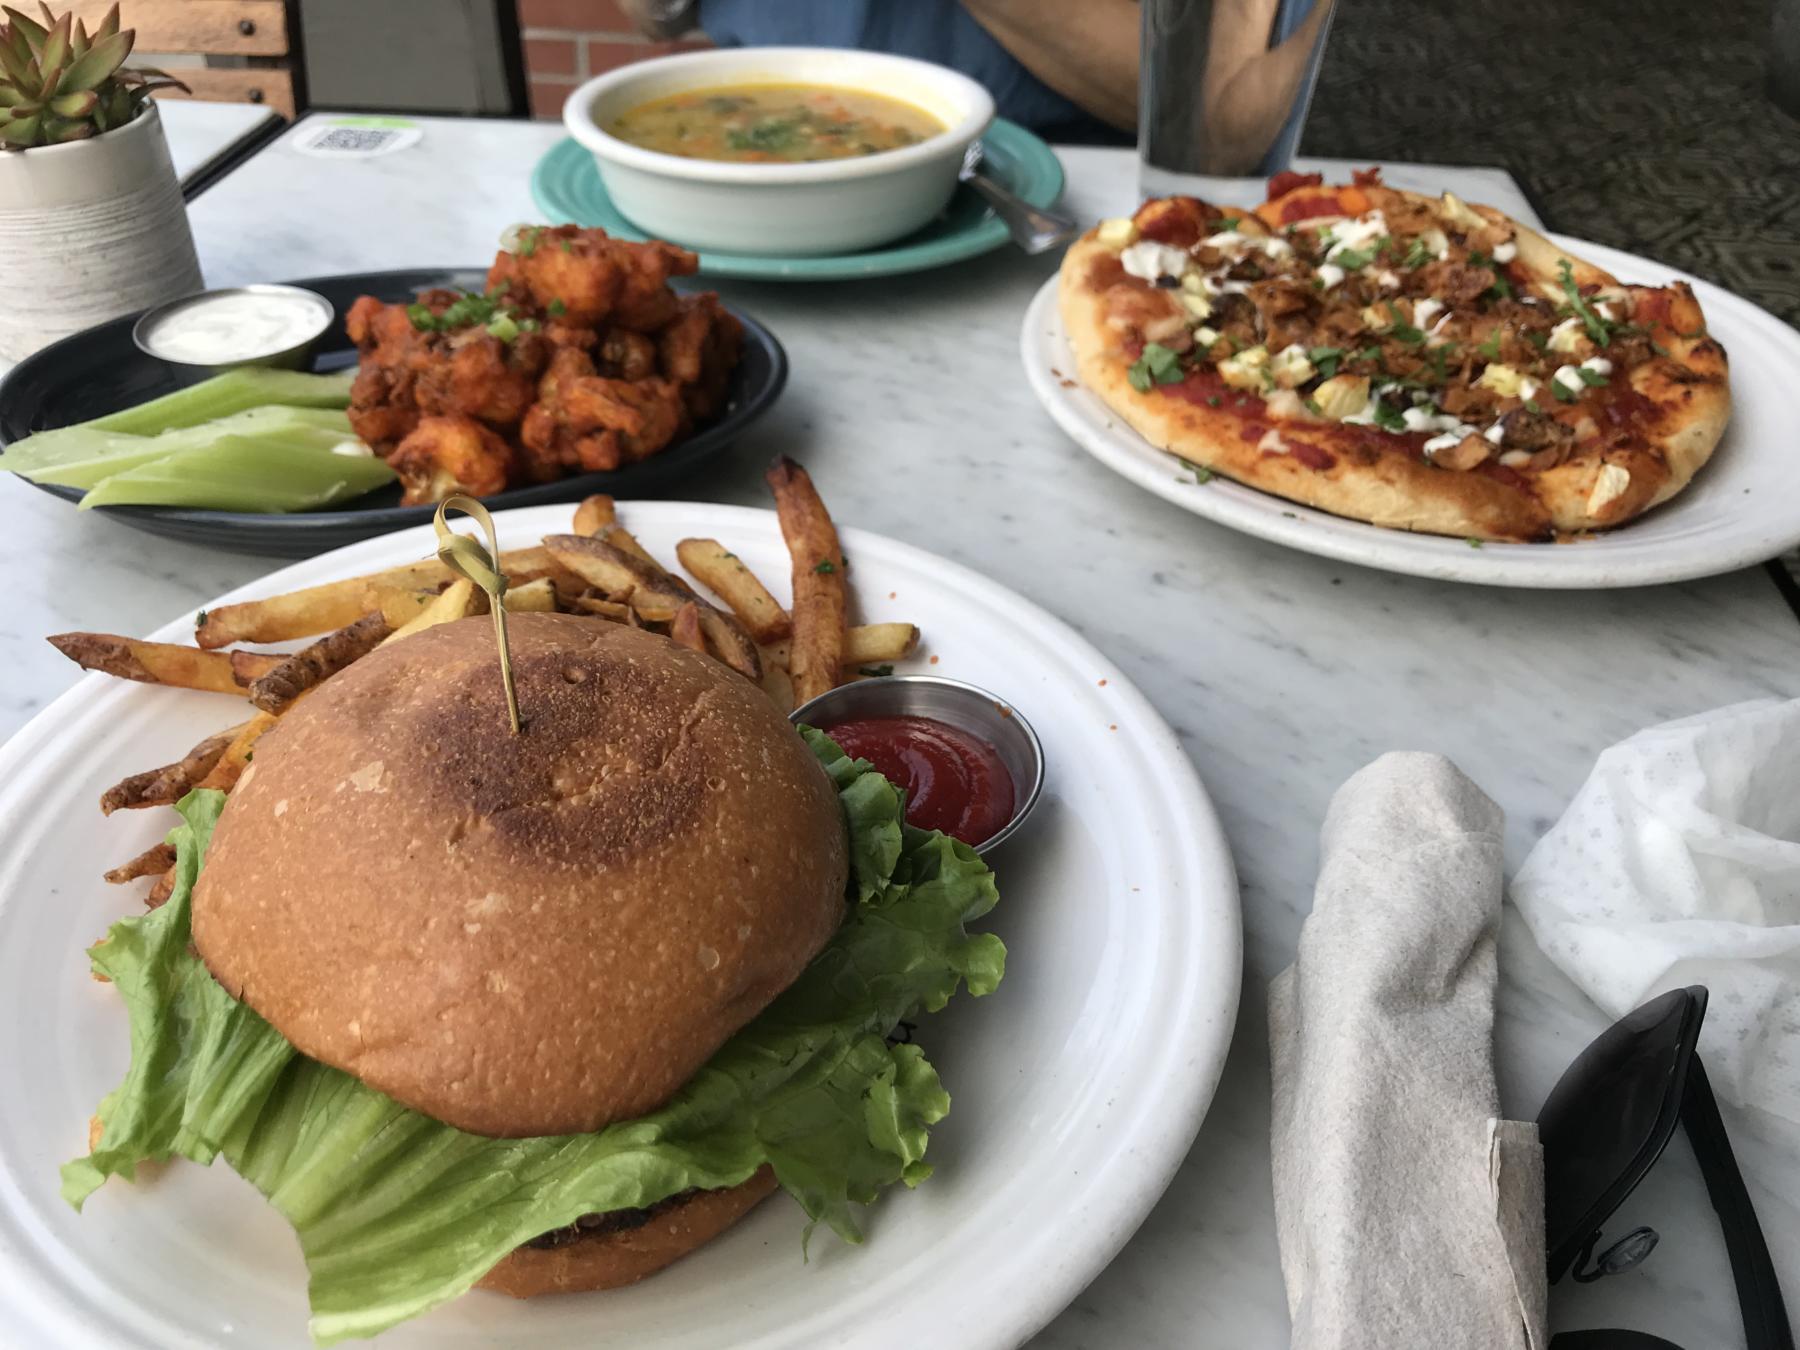 Black Bean Burger, Pizza, Soup at Cafe Gratitude